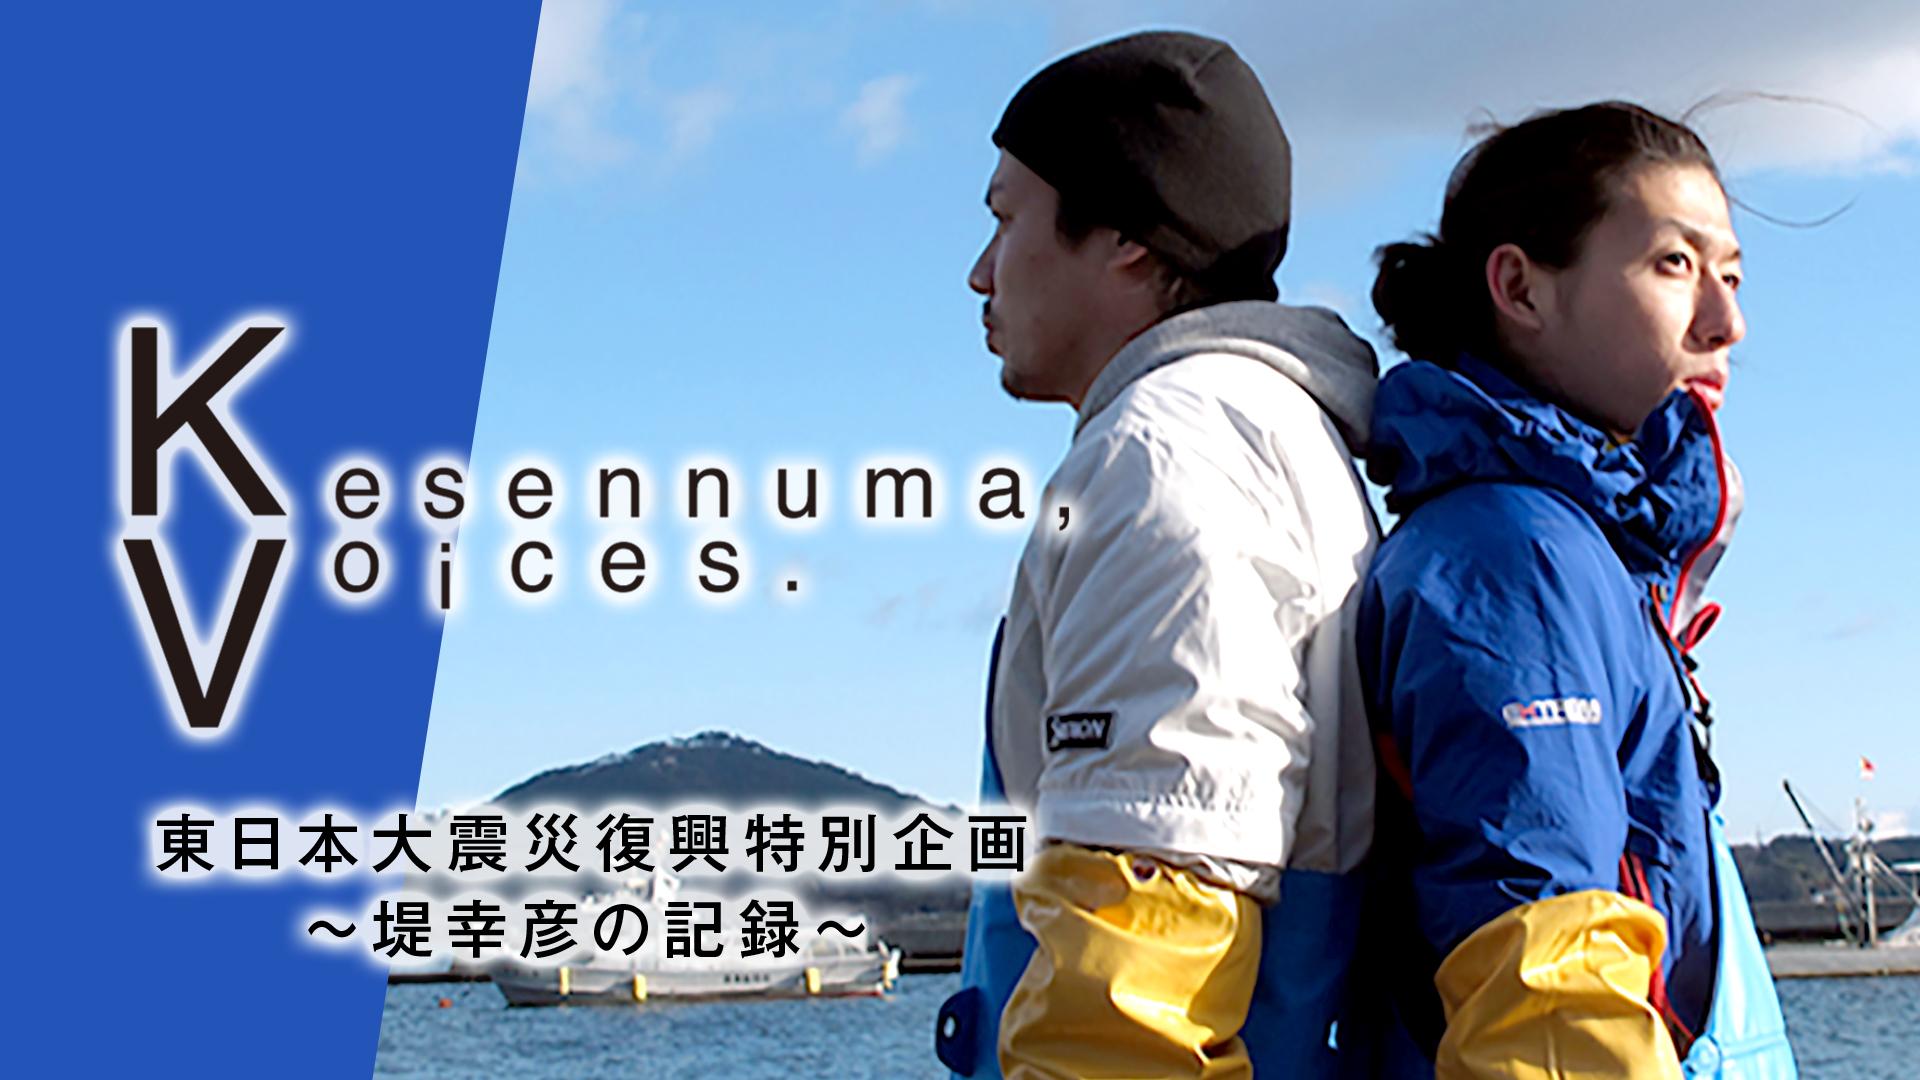 Kesennuma,Voices. 東日本大震災復興特別企画~堤幸彦の記録~